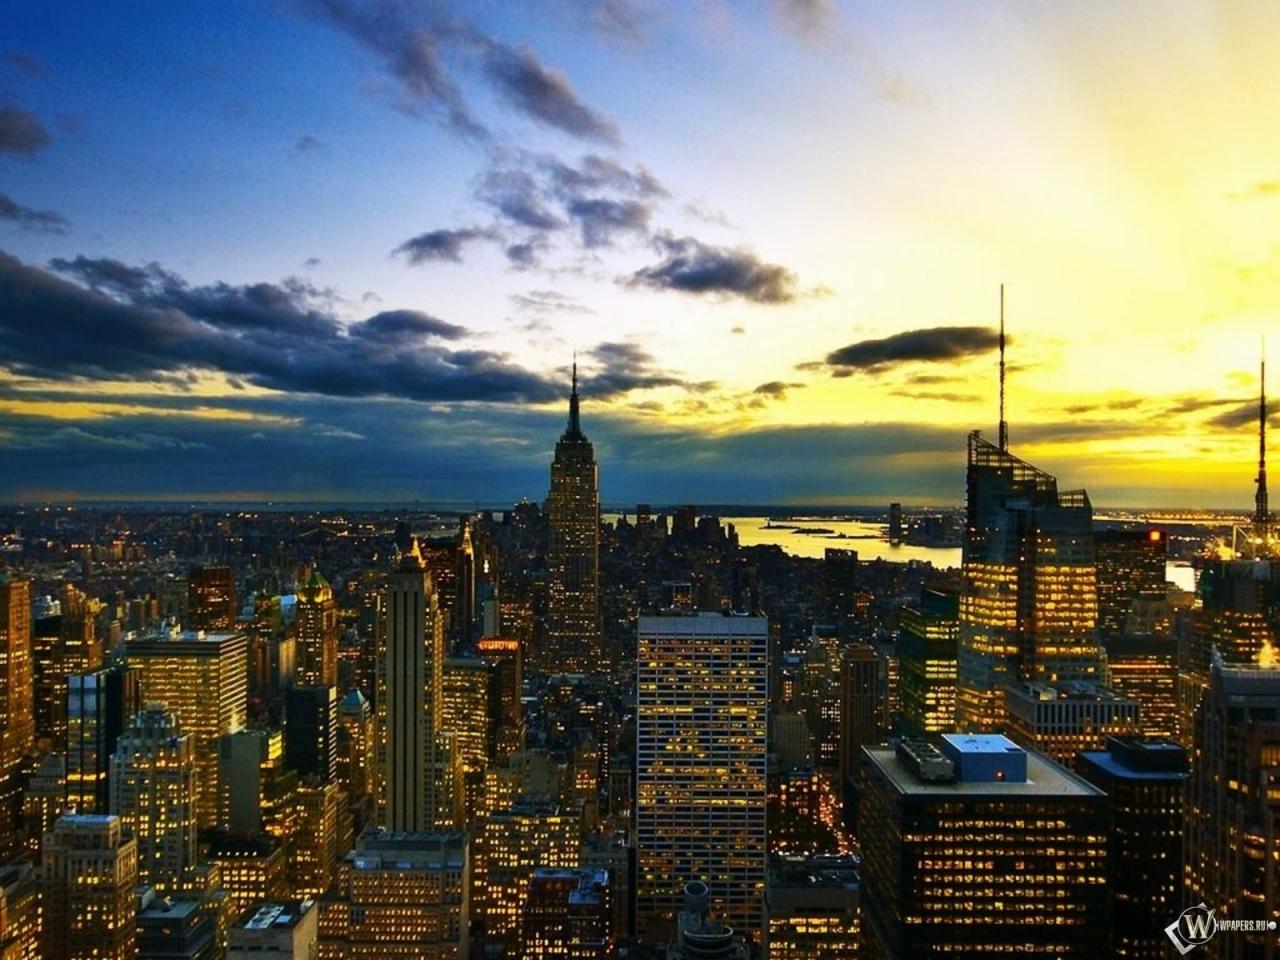 New York Skyline At Sunset 1280x960